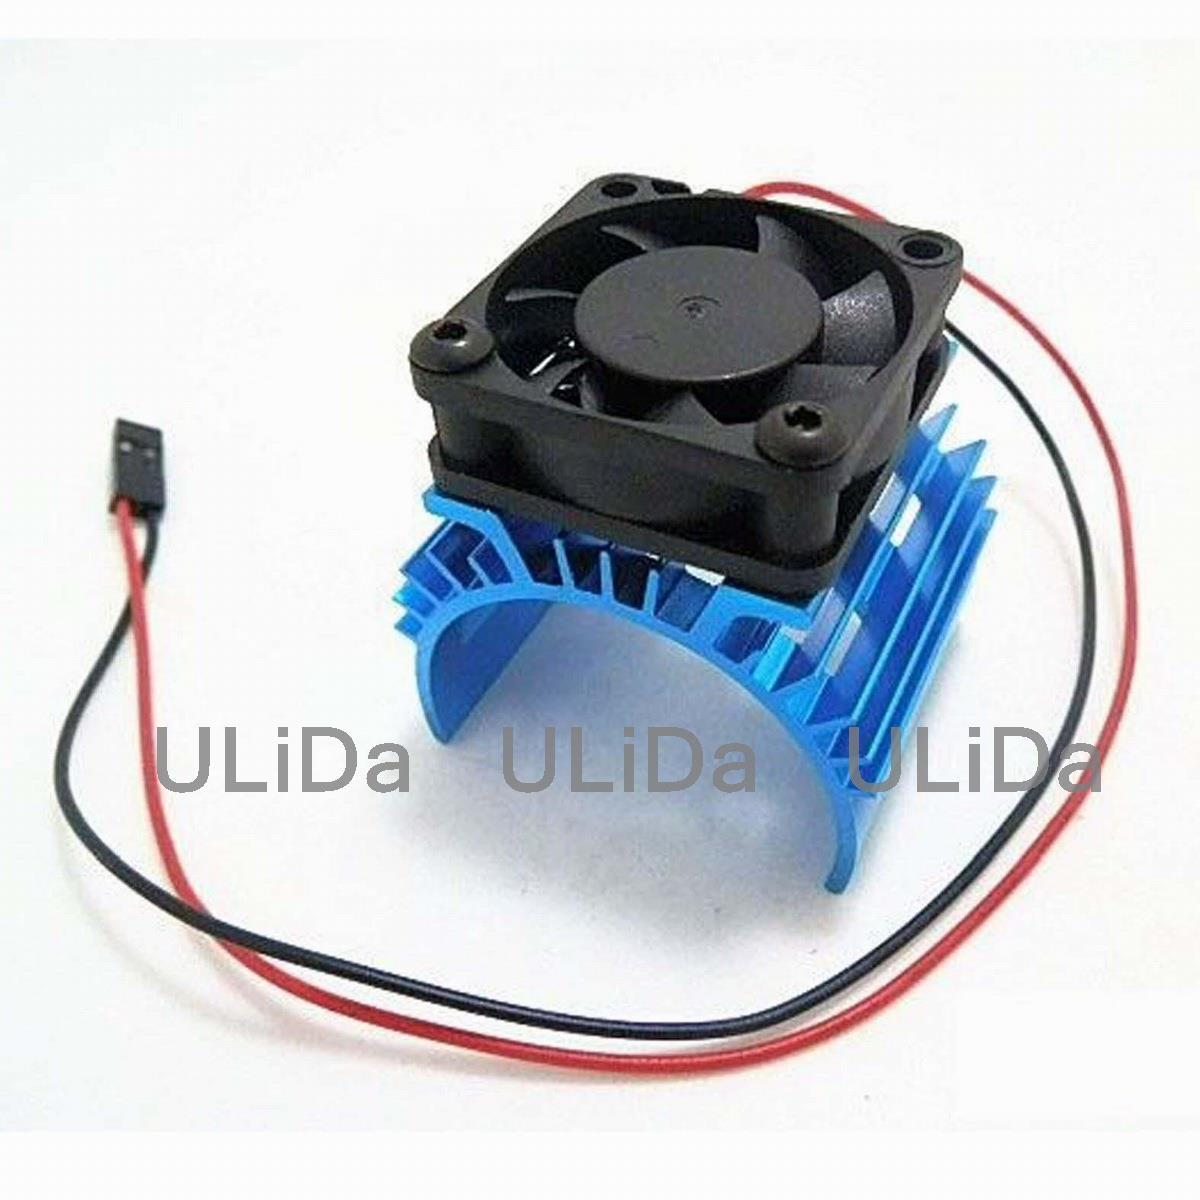 RC Aluminum Heat Sink + Fan Cooling For 540/550 Model Car Motor 7017